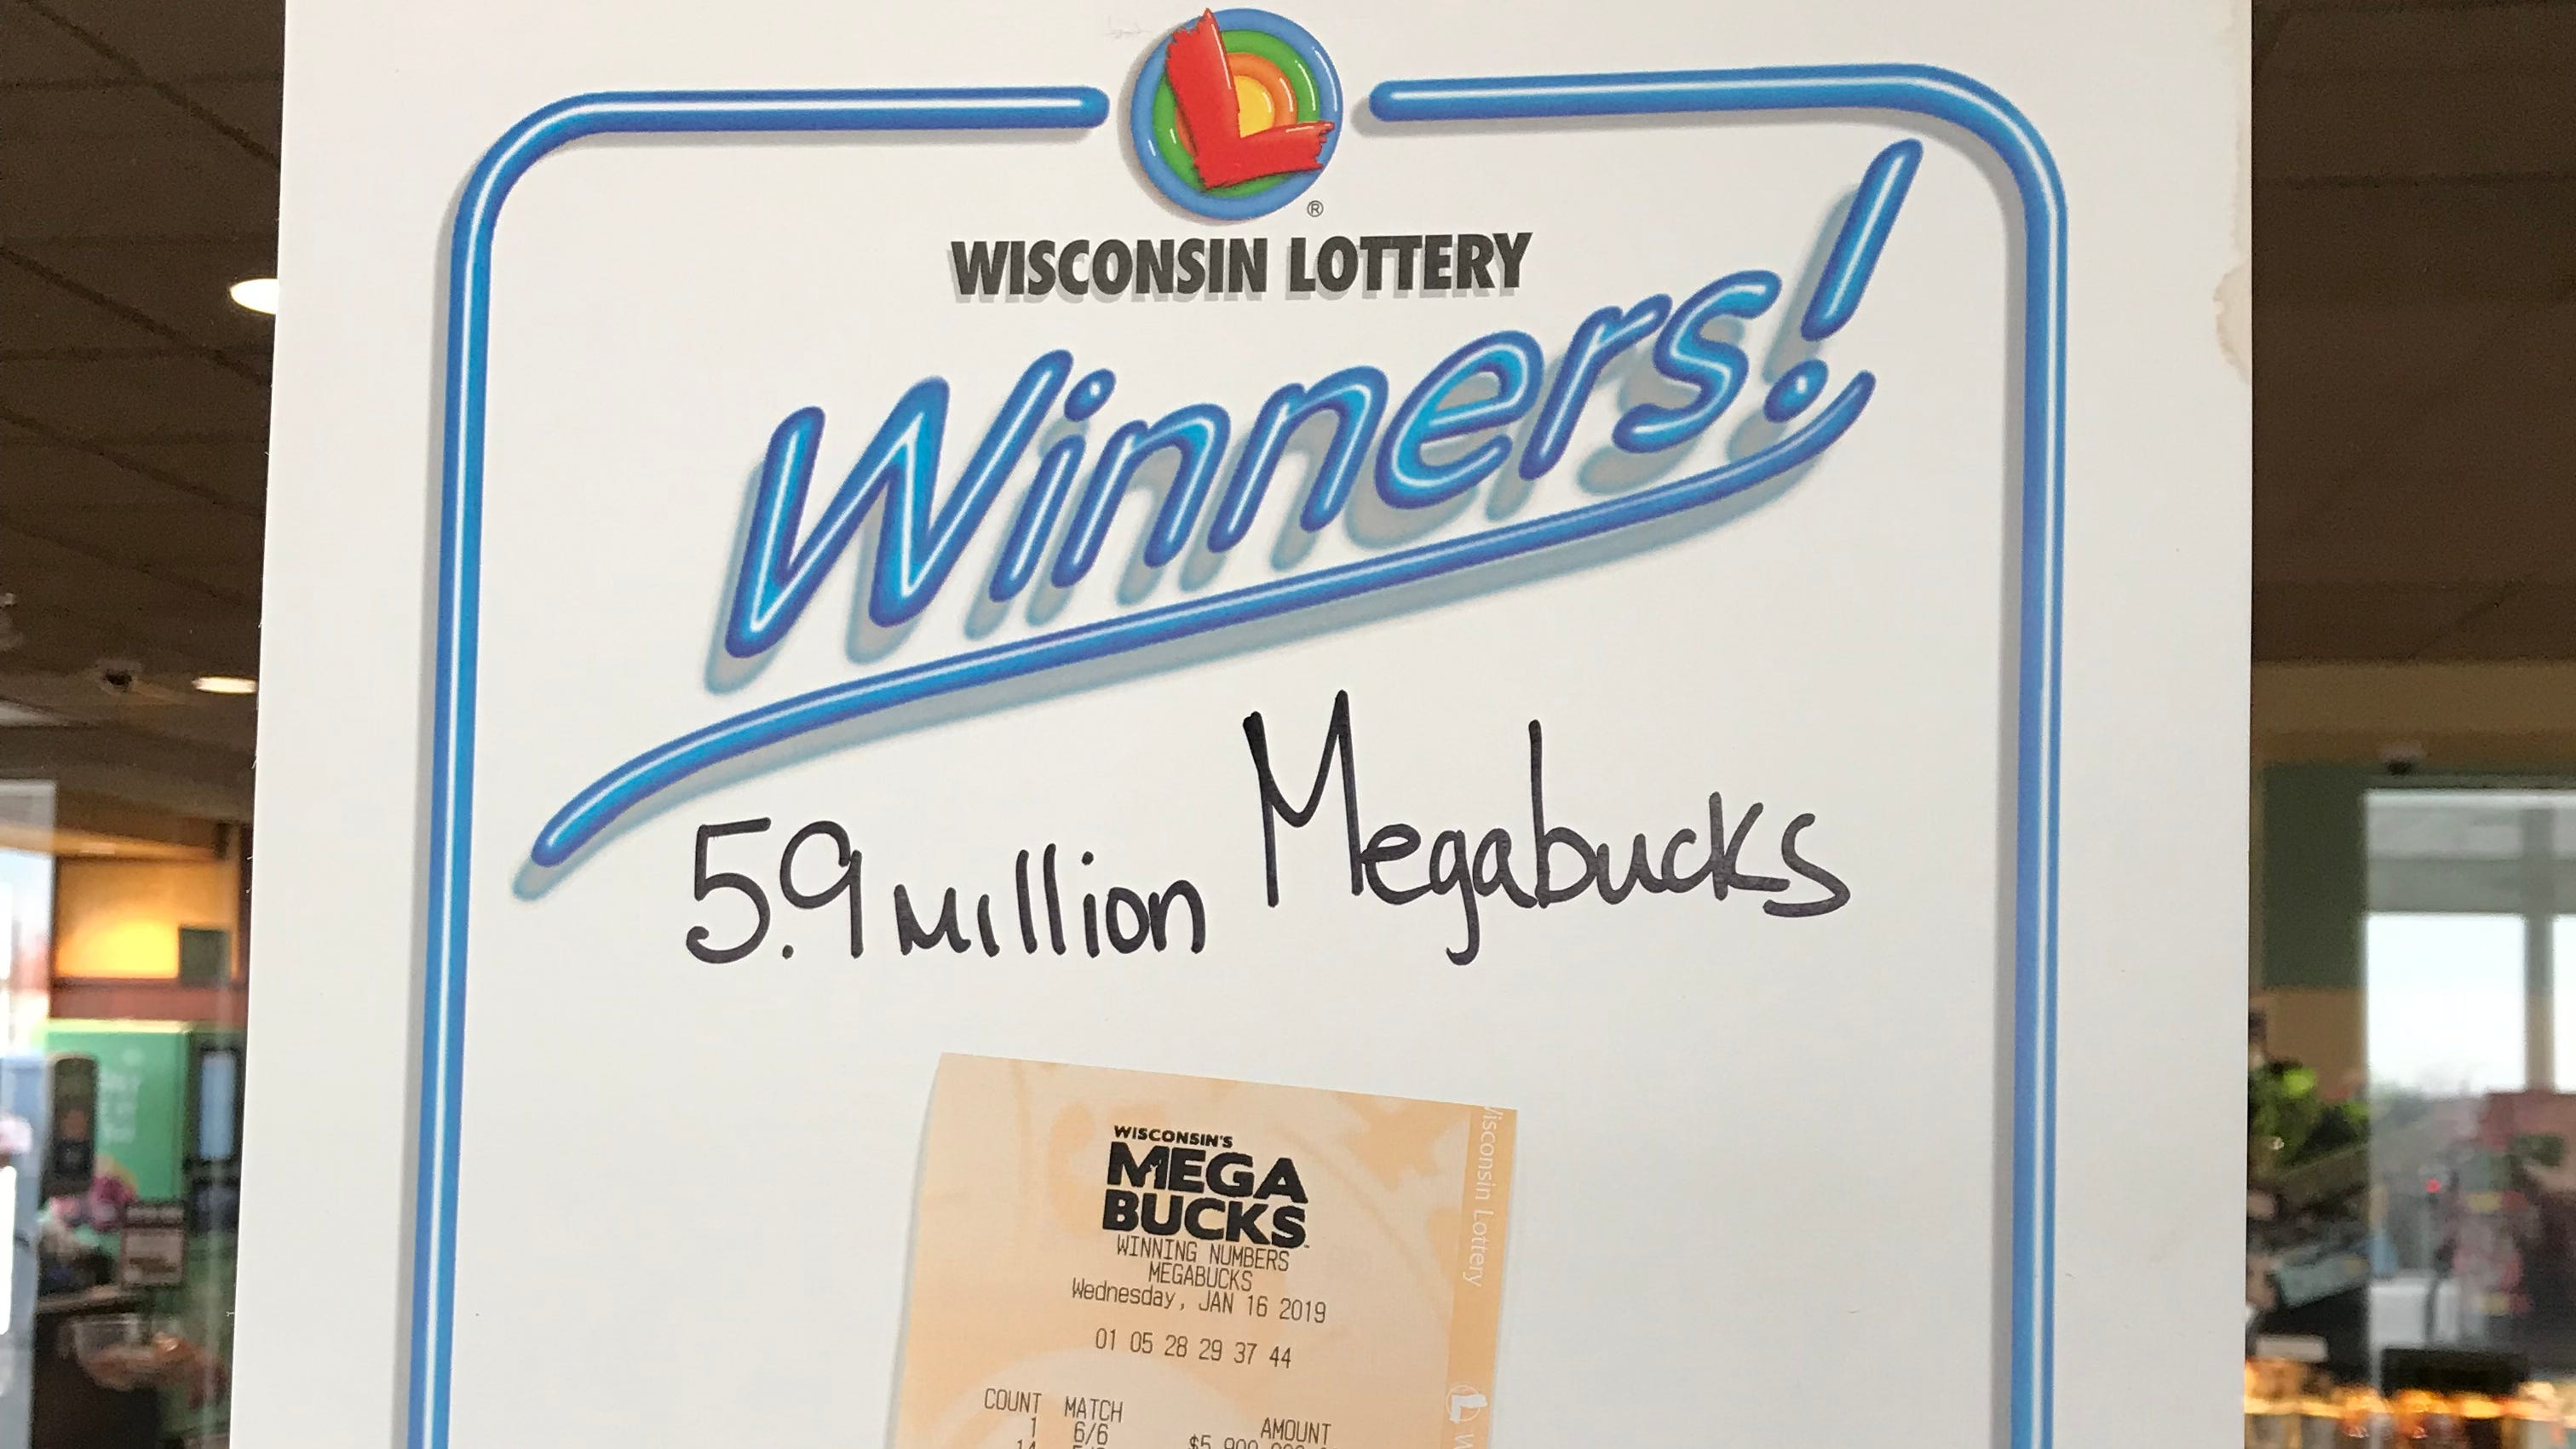 Wisconsin Lottery Sheboygan Kwik Trip Sells Winning Megabucks Ticket